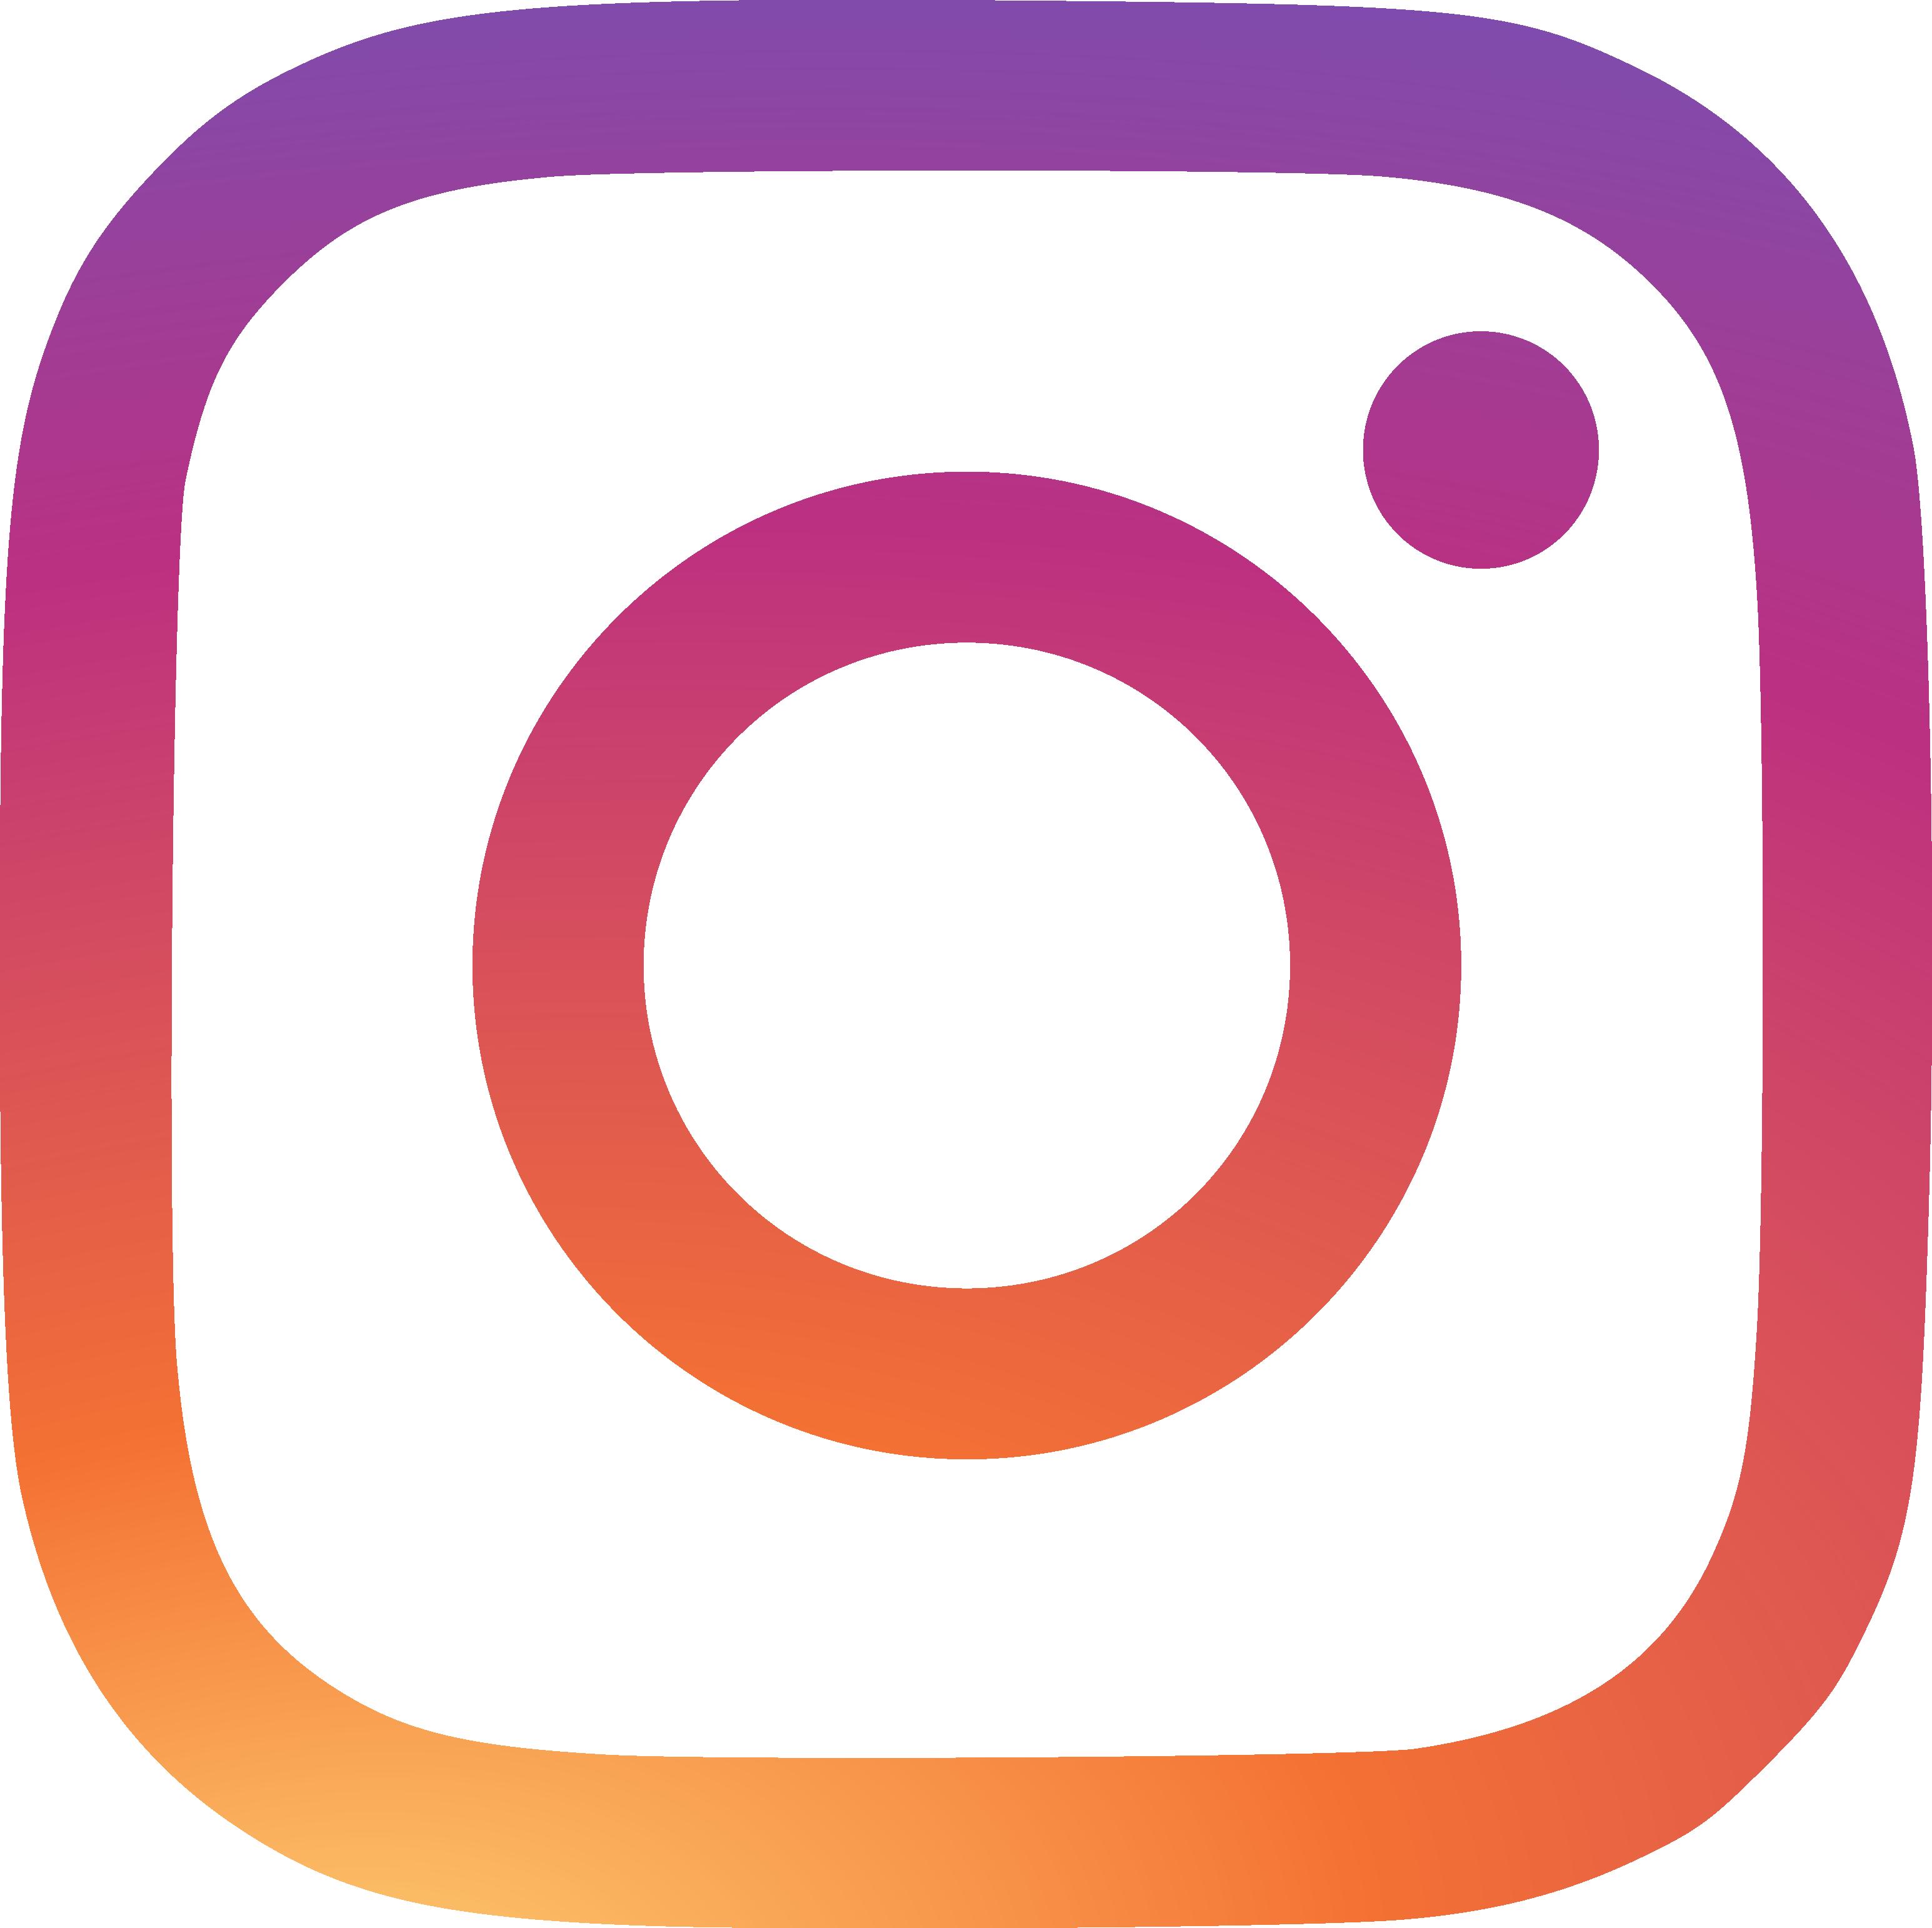 Number 6 clipart logo. Instagram at getdrawings com